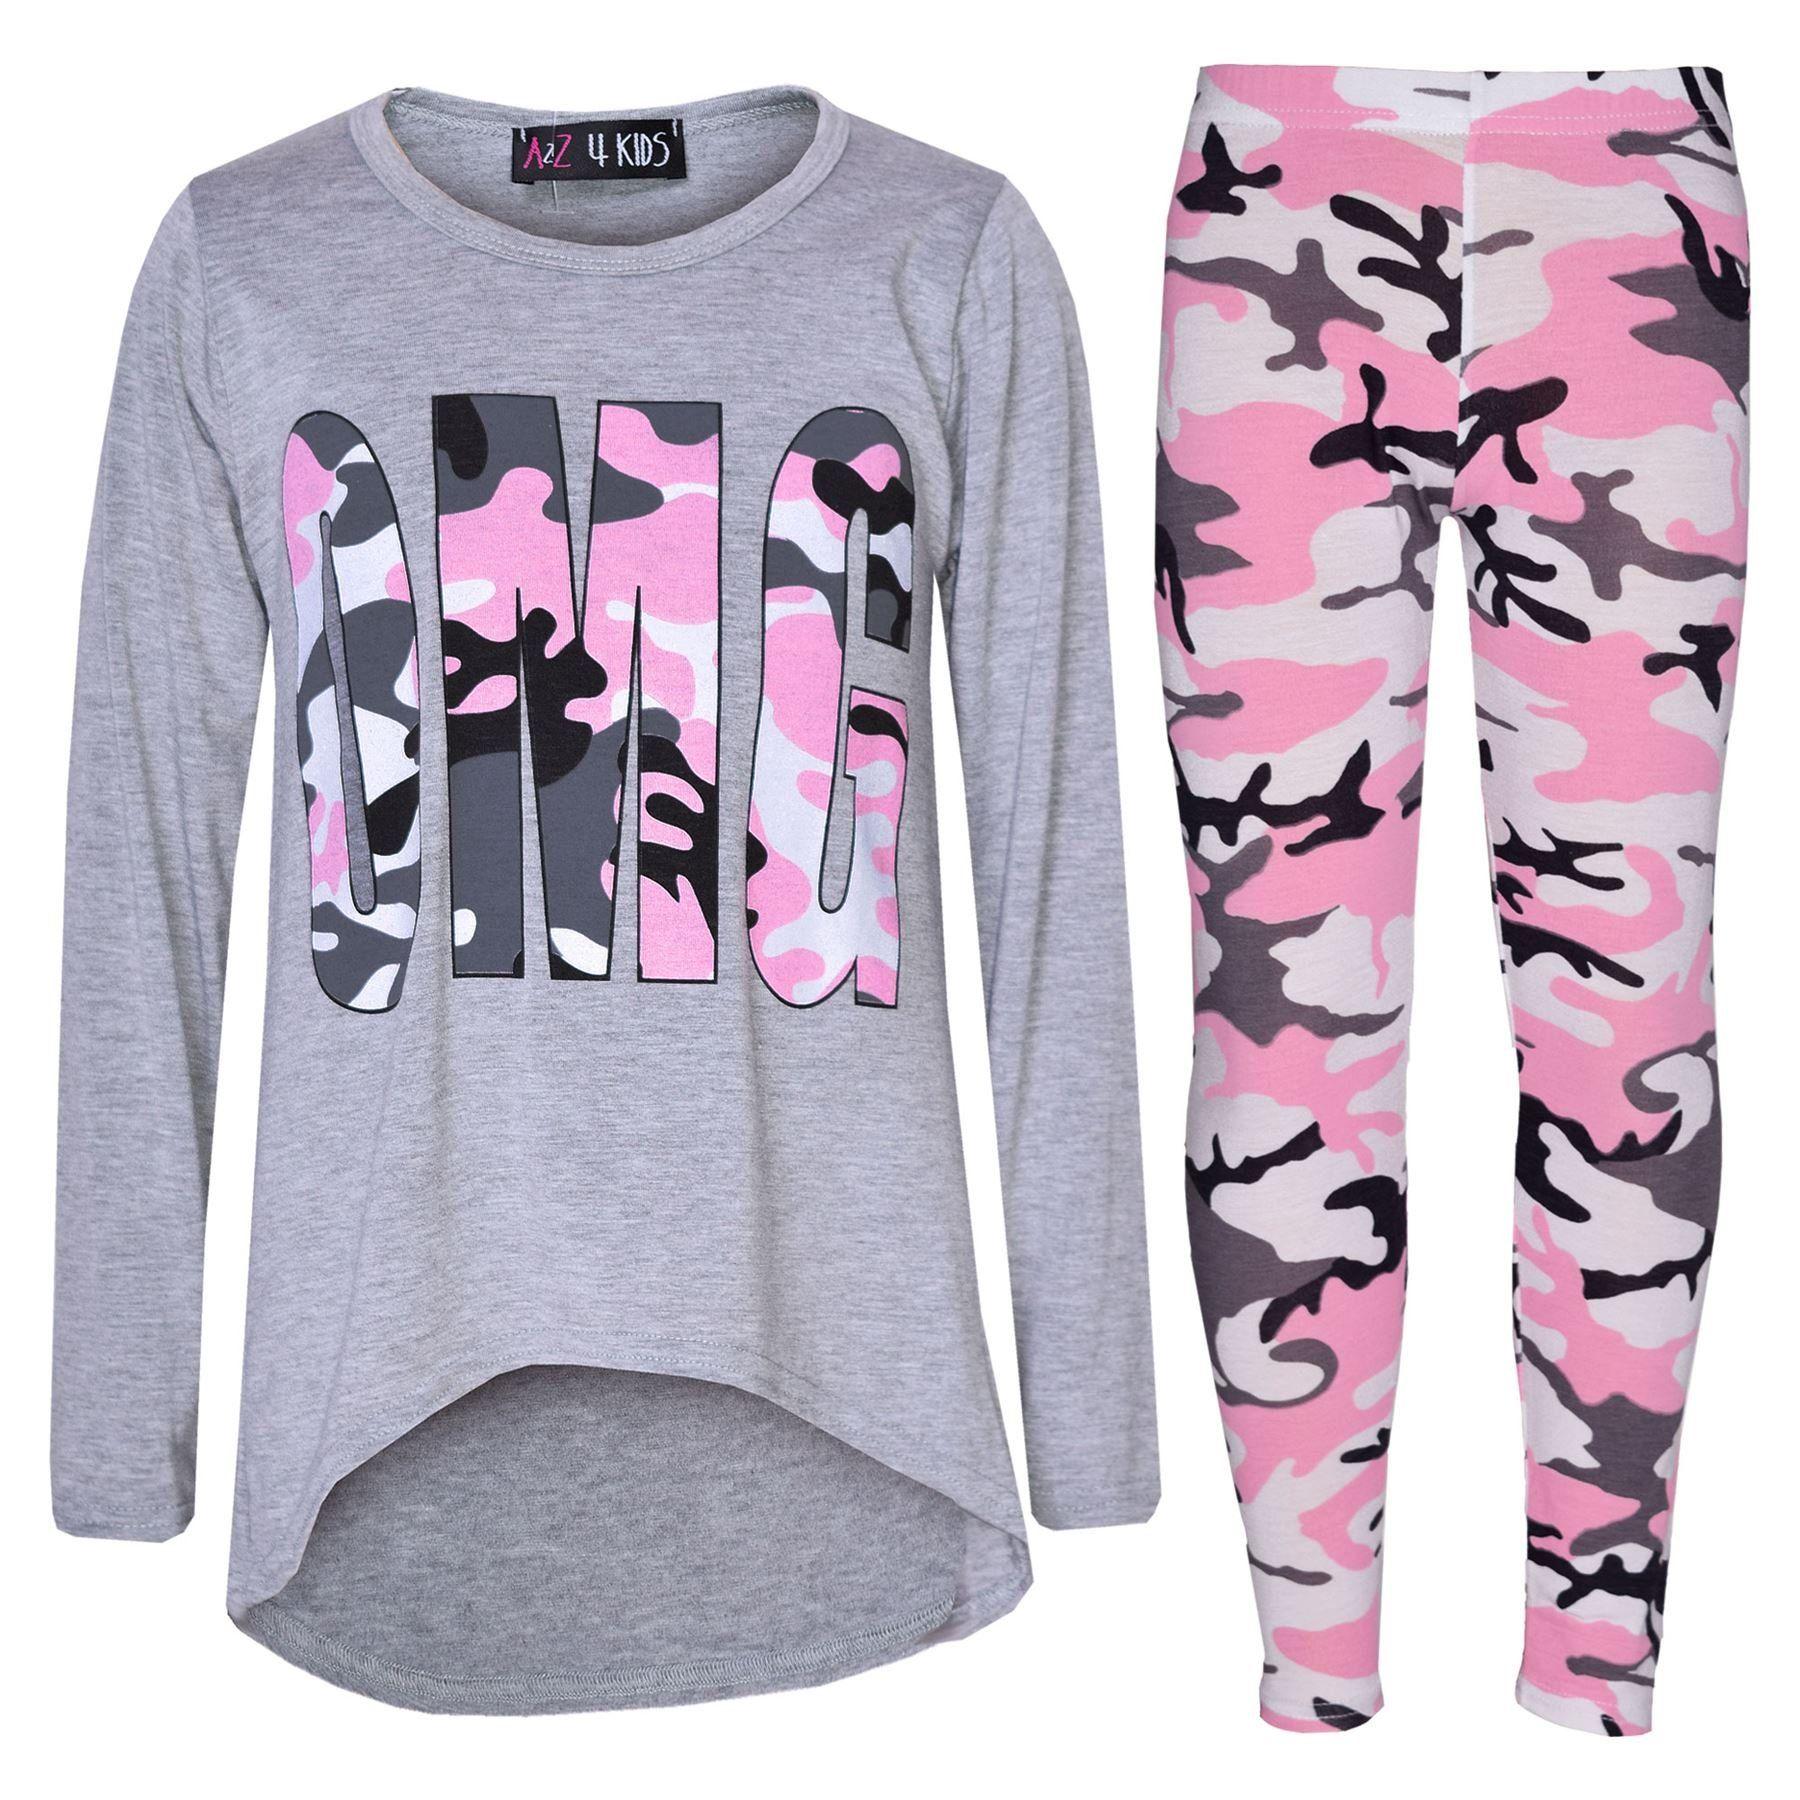 7e3ecdccaf0b Girls Top Kids Designer's OMG Camouflage Print Shirt Tops & Legging Set  7-13 Yr